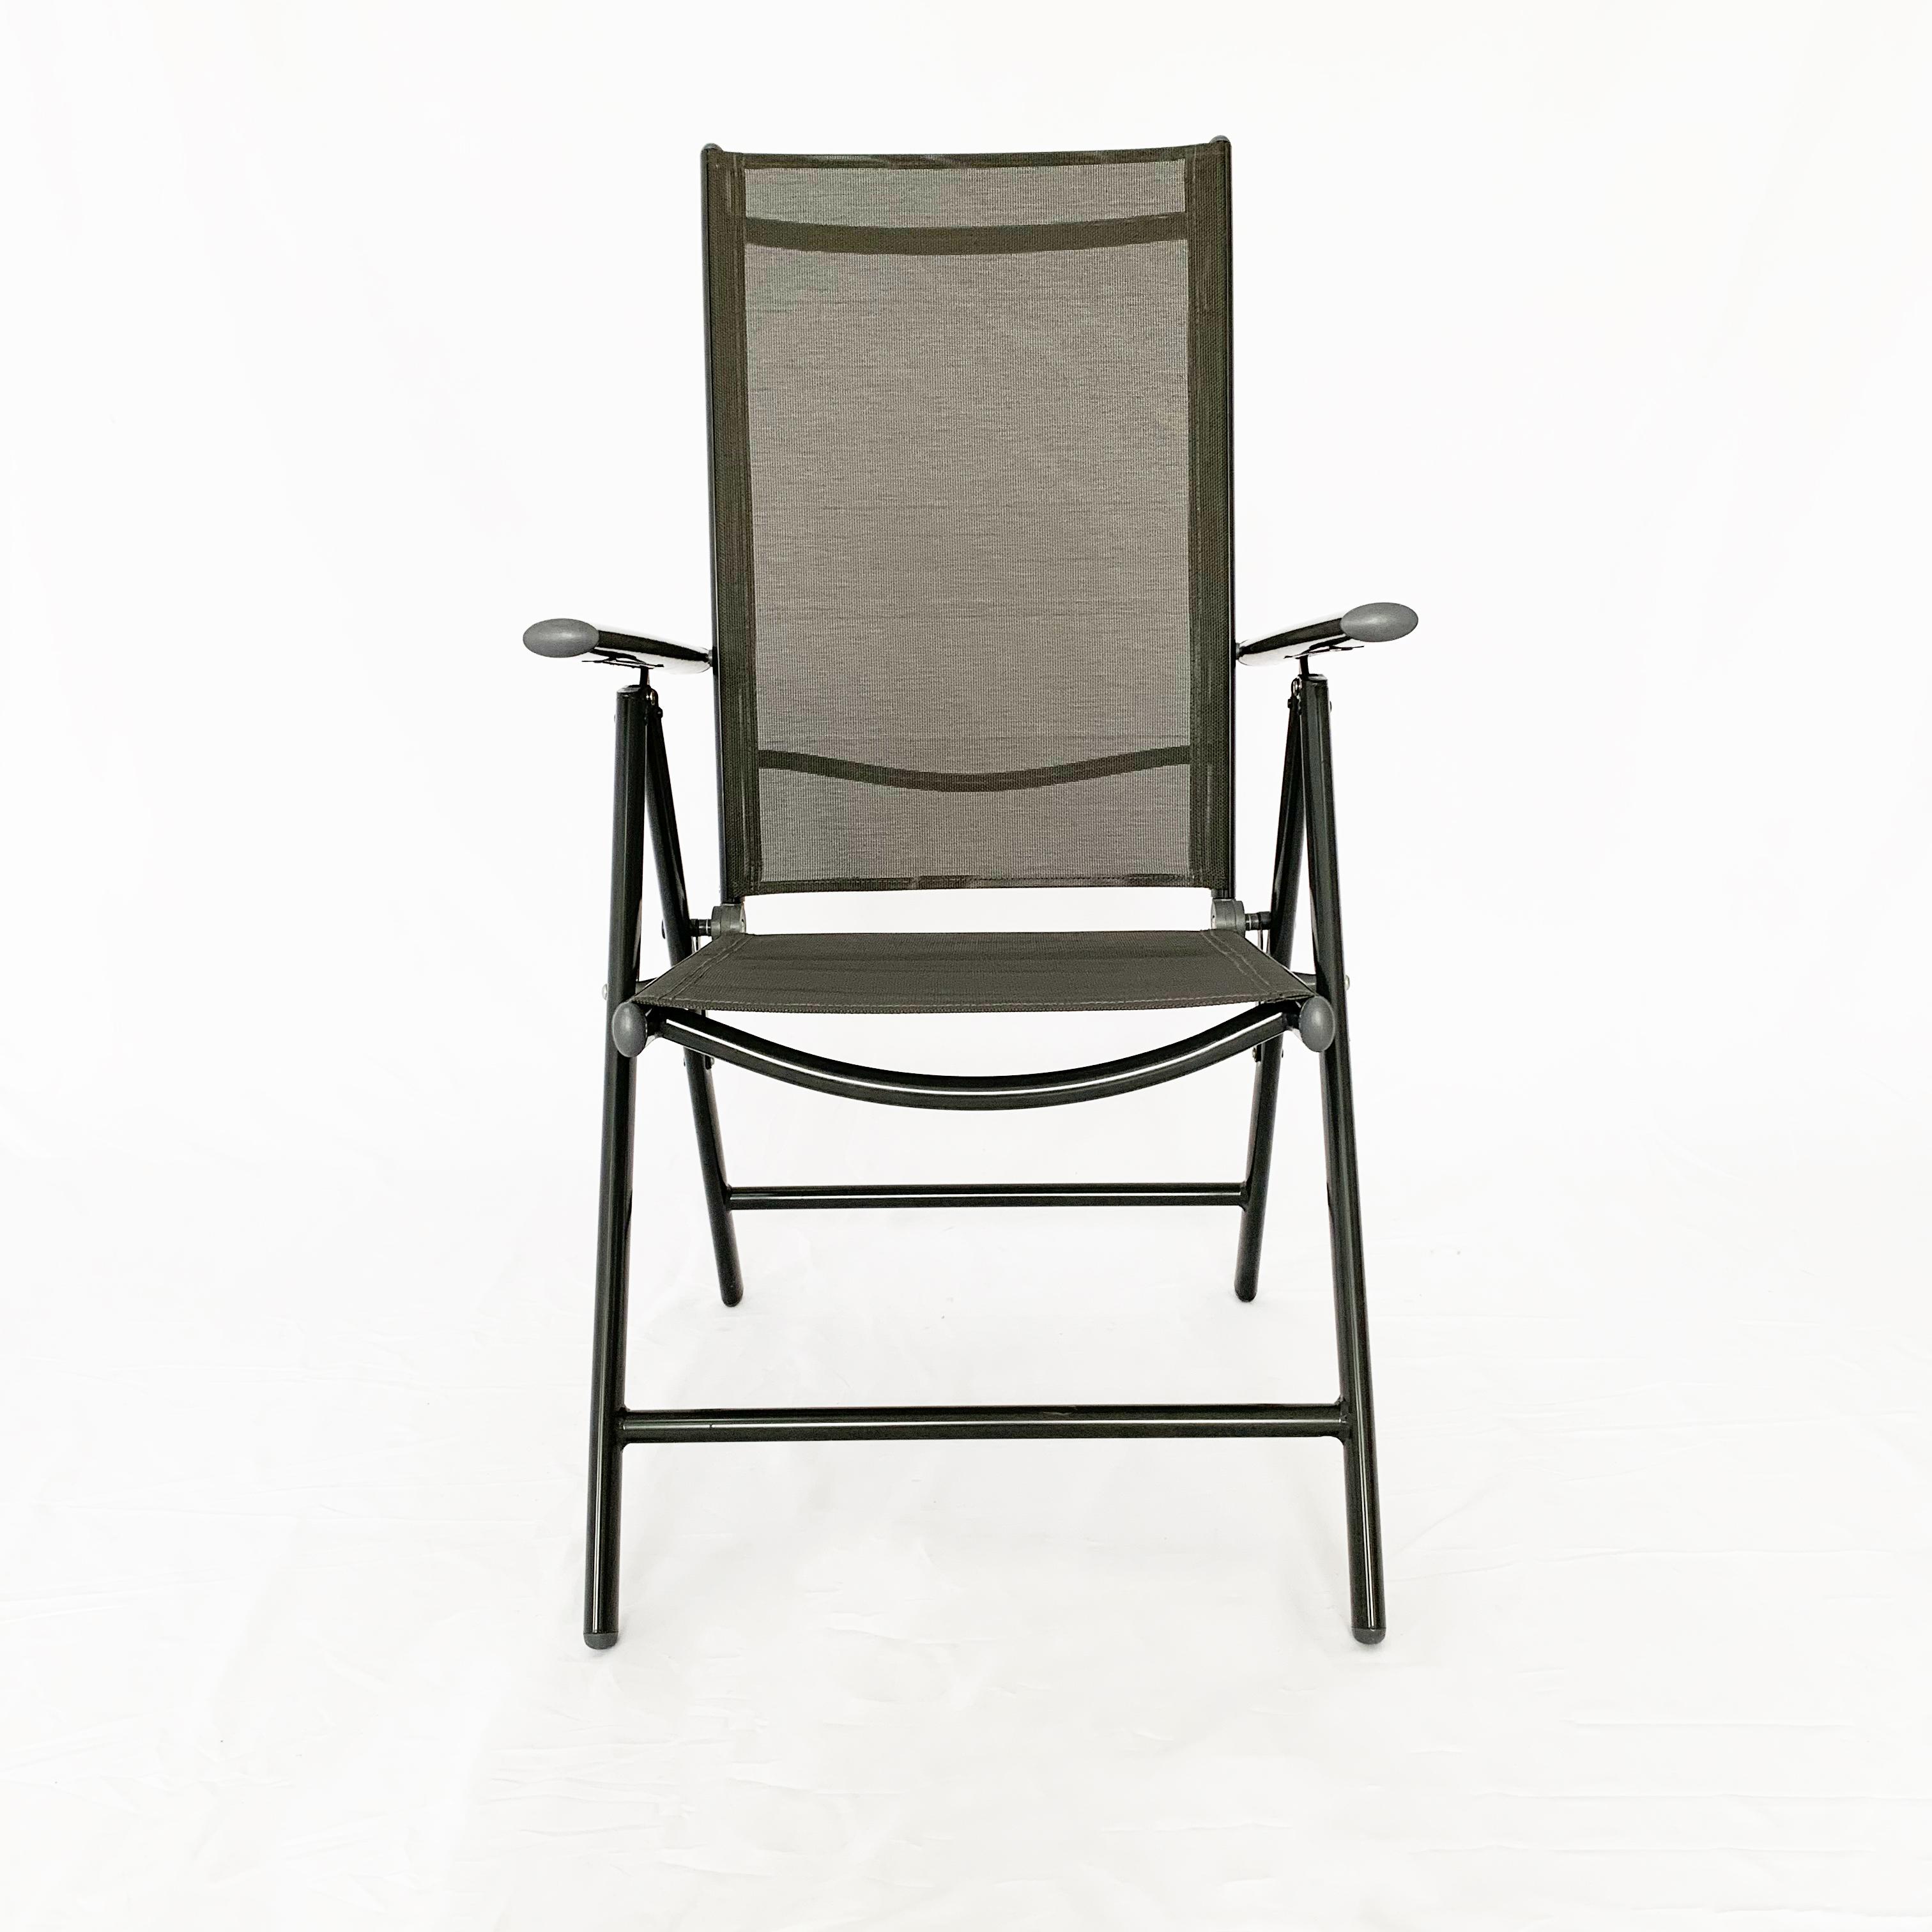 Fashion Practical steel frame 7 seven position outdoor garden folding chair